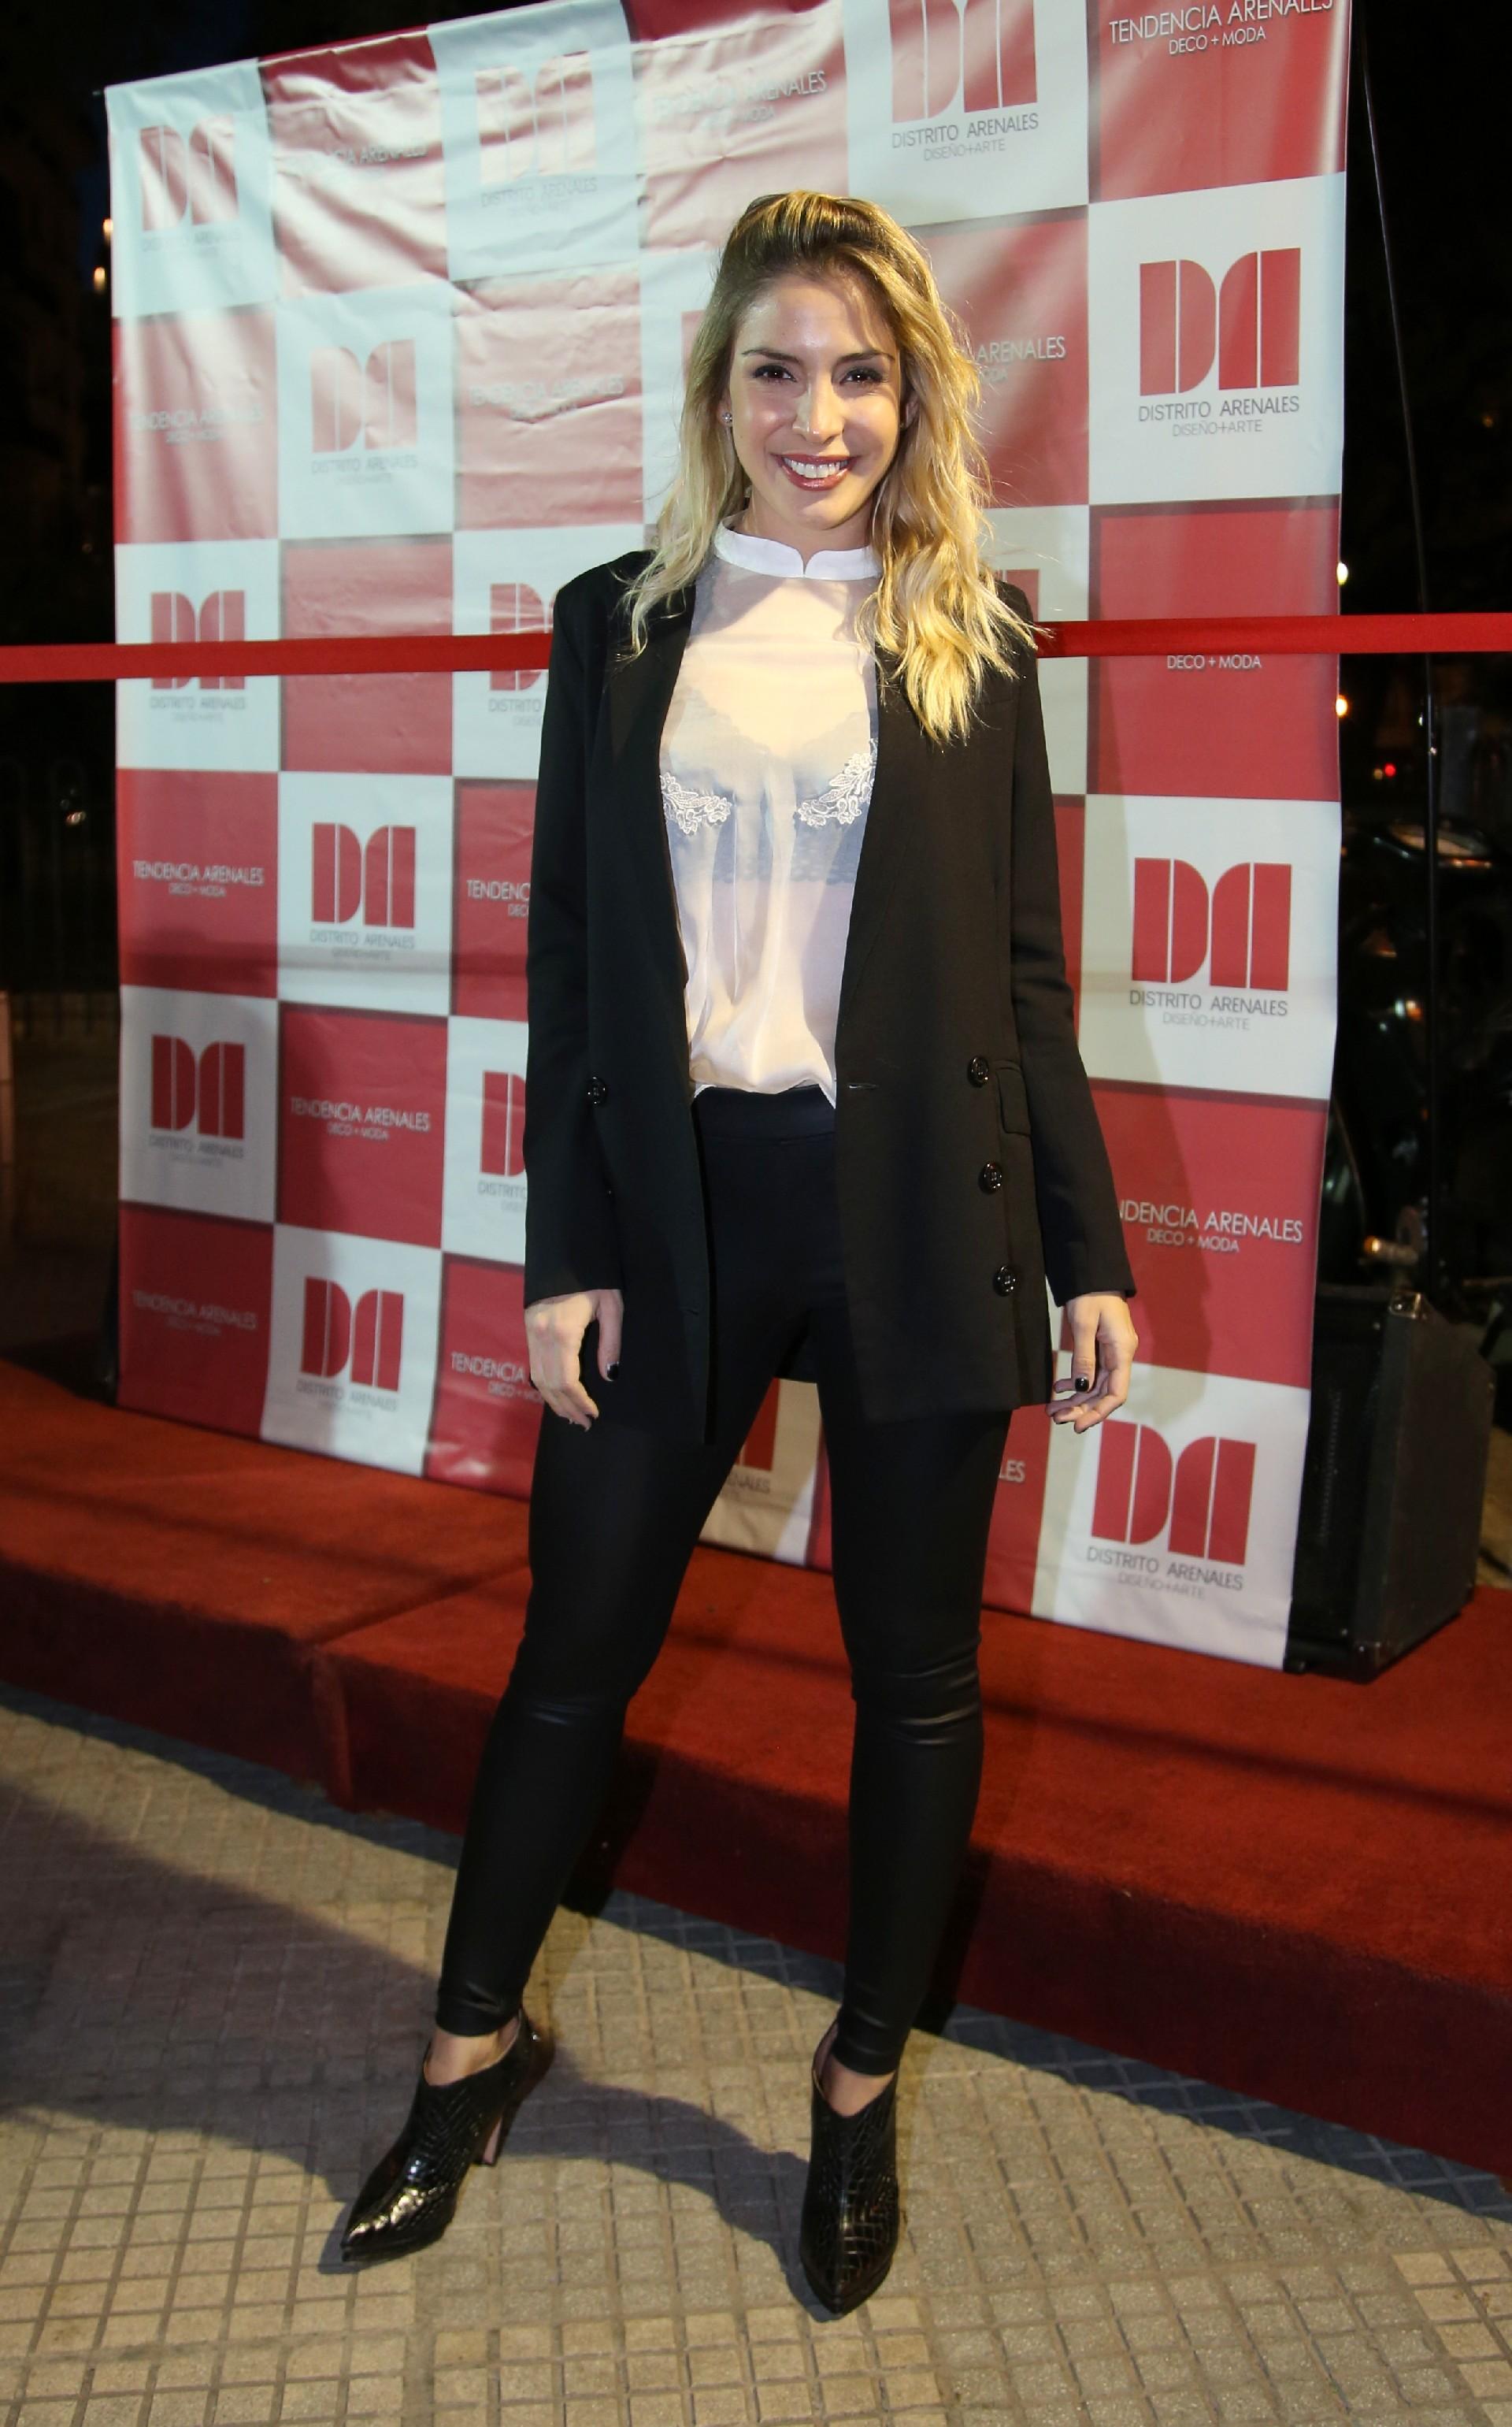 Luly Drozdek